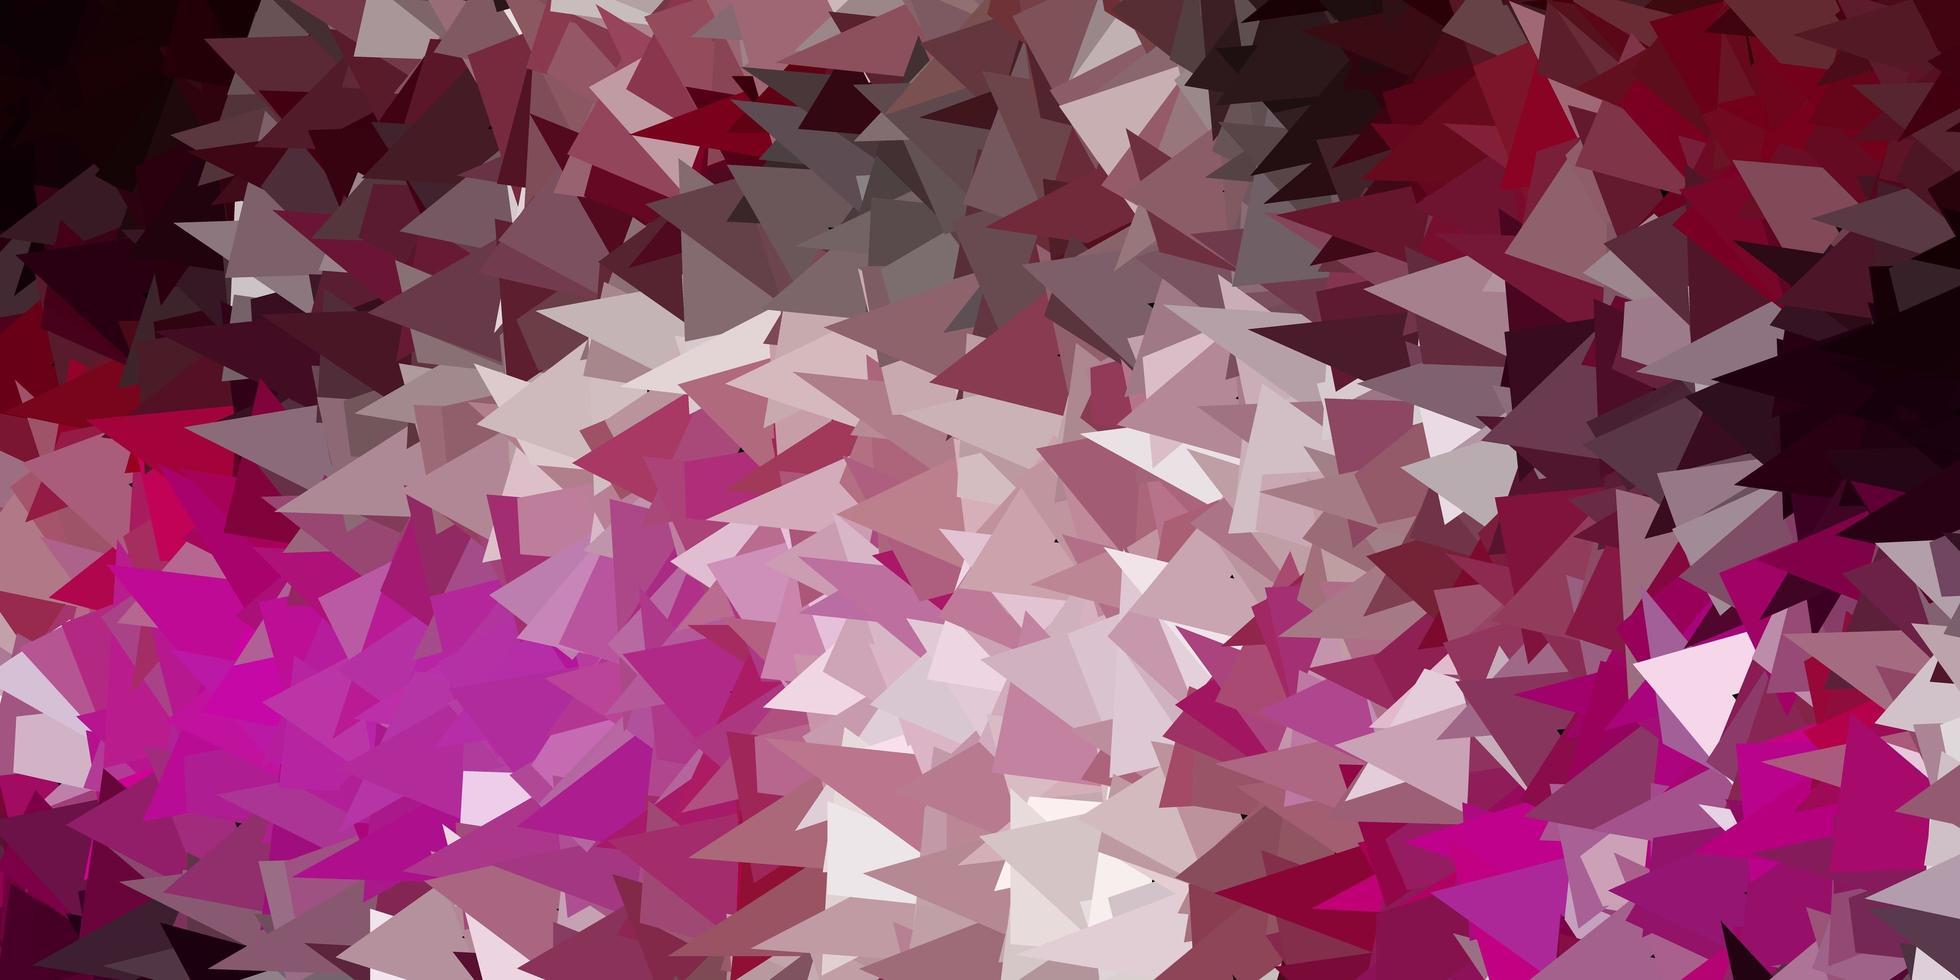 papel tapiz poligonal geométrico vector rosa oscuro.